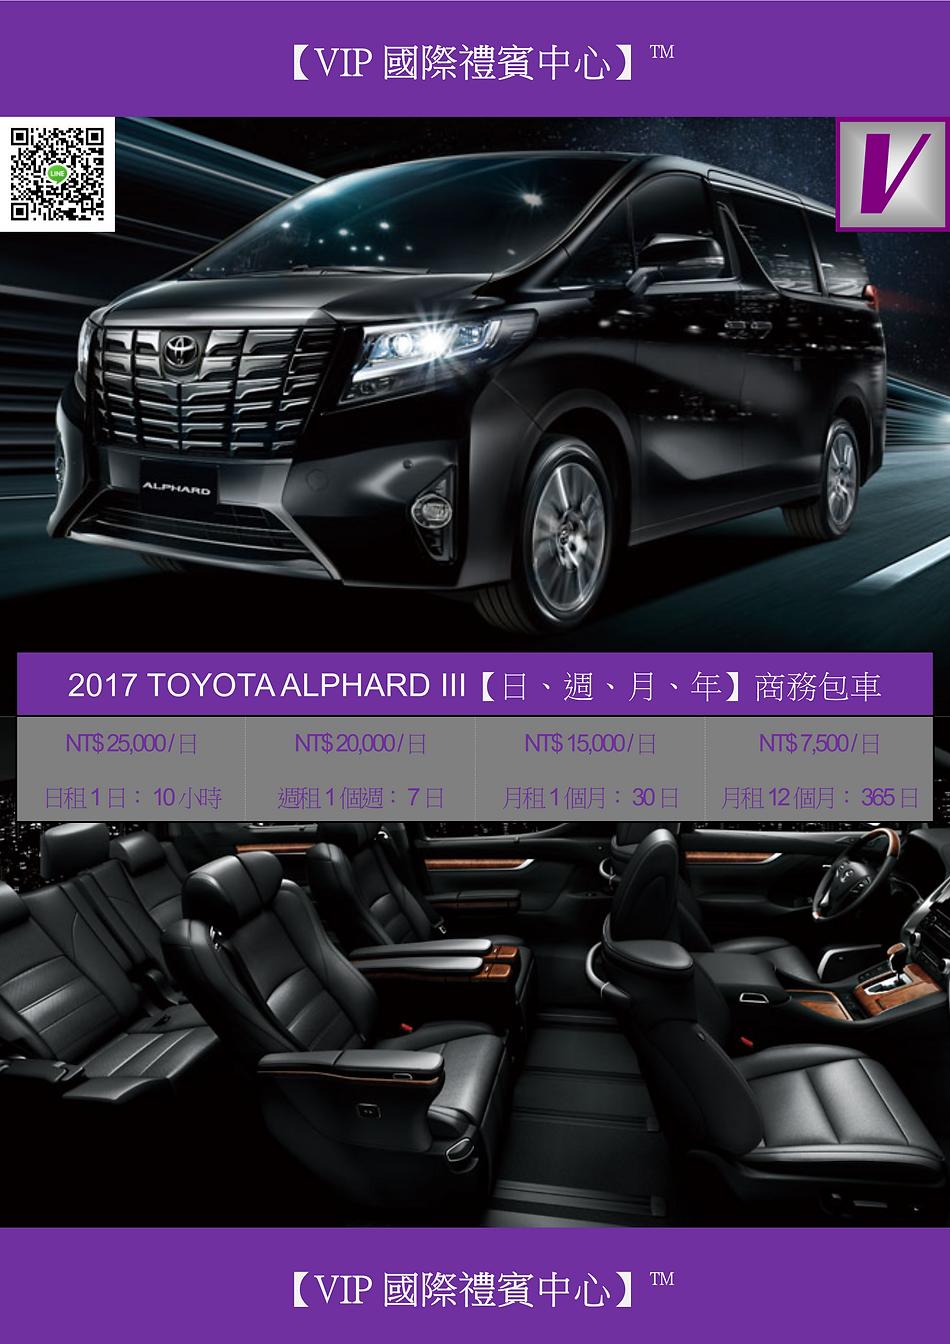 VIP國際禮賓中心 2017 TOYOTA ALPHARD III DM.png